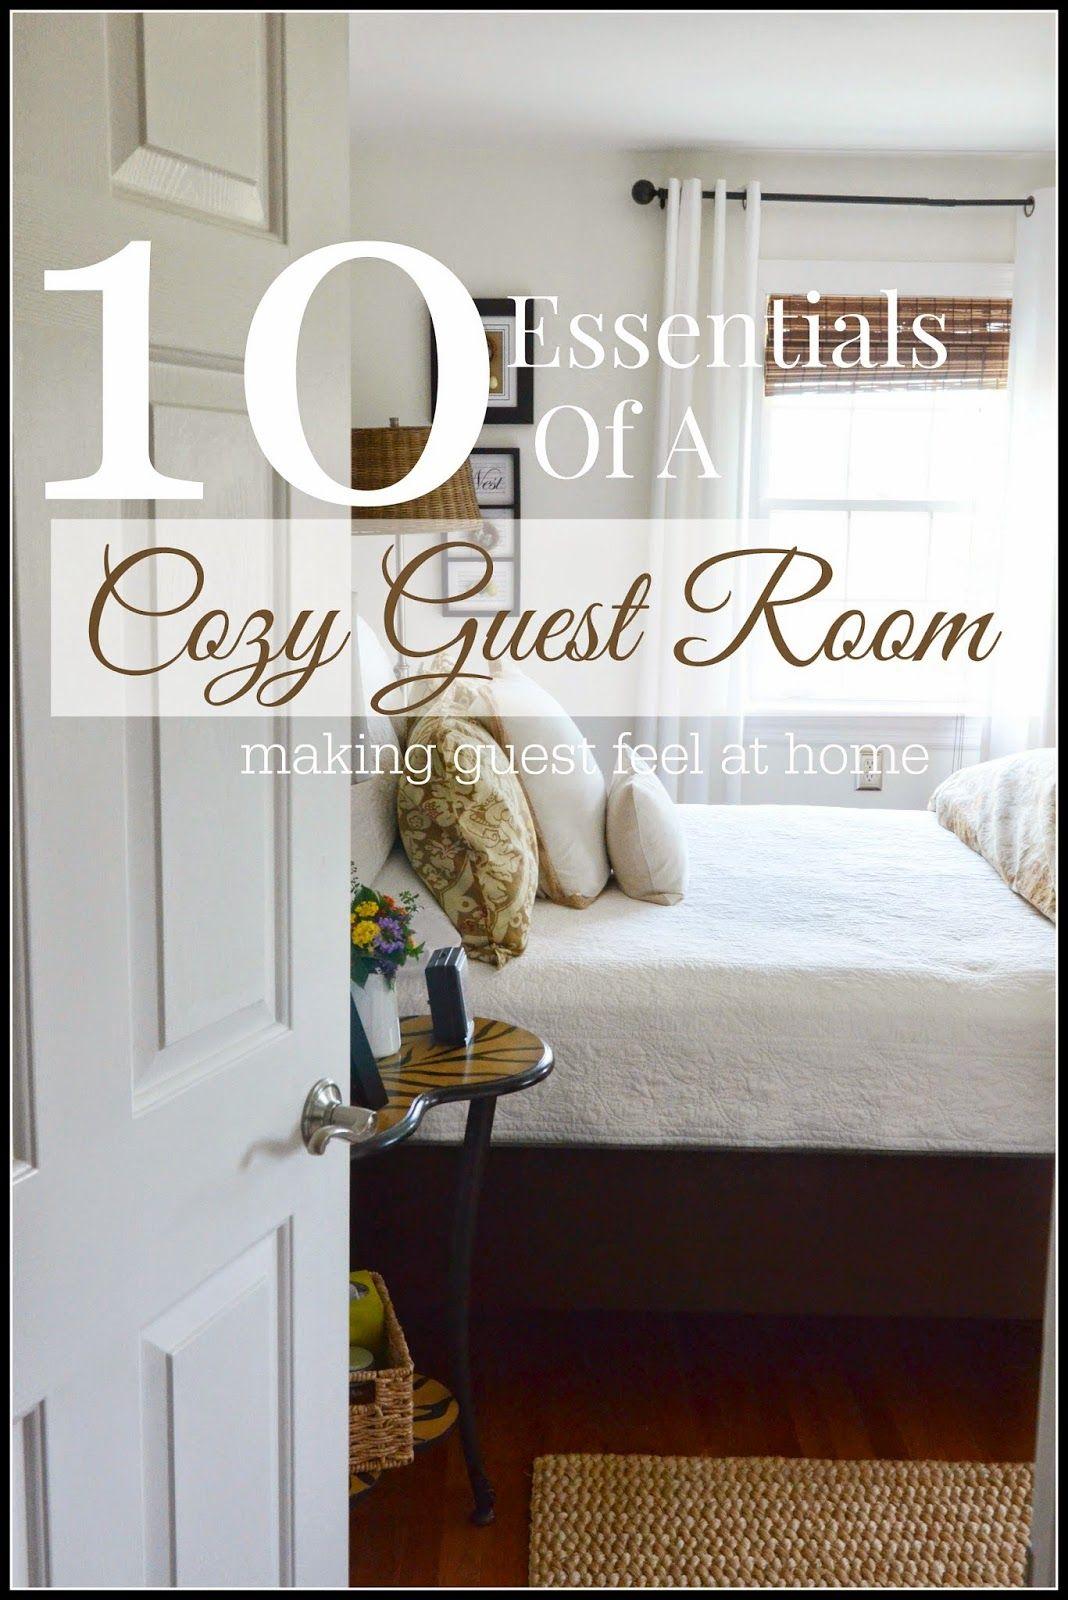 10 ESSENTIALS OF A COZY GUEST ROOM Design